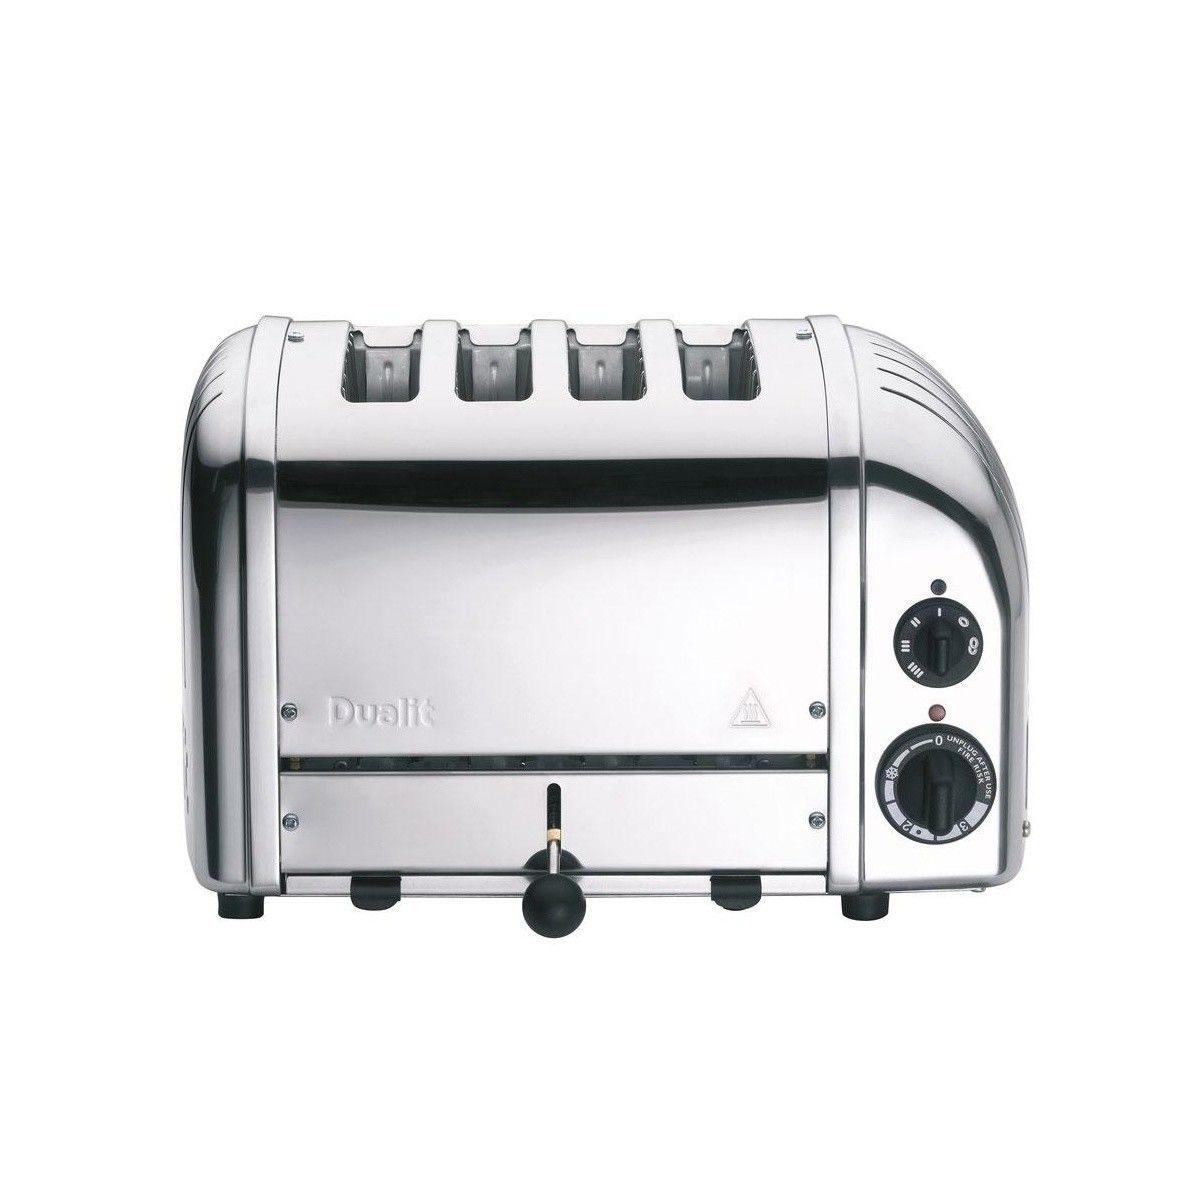 dualit classic newgen vario 4 toaster dualit kitchen helpers kitchenware accessories. Black Bedroom Furniture Sets. Home Design Ideas